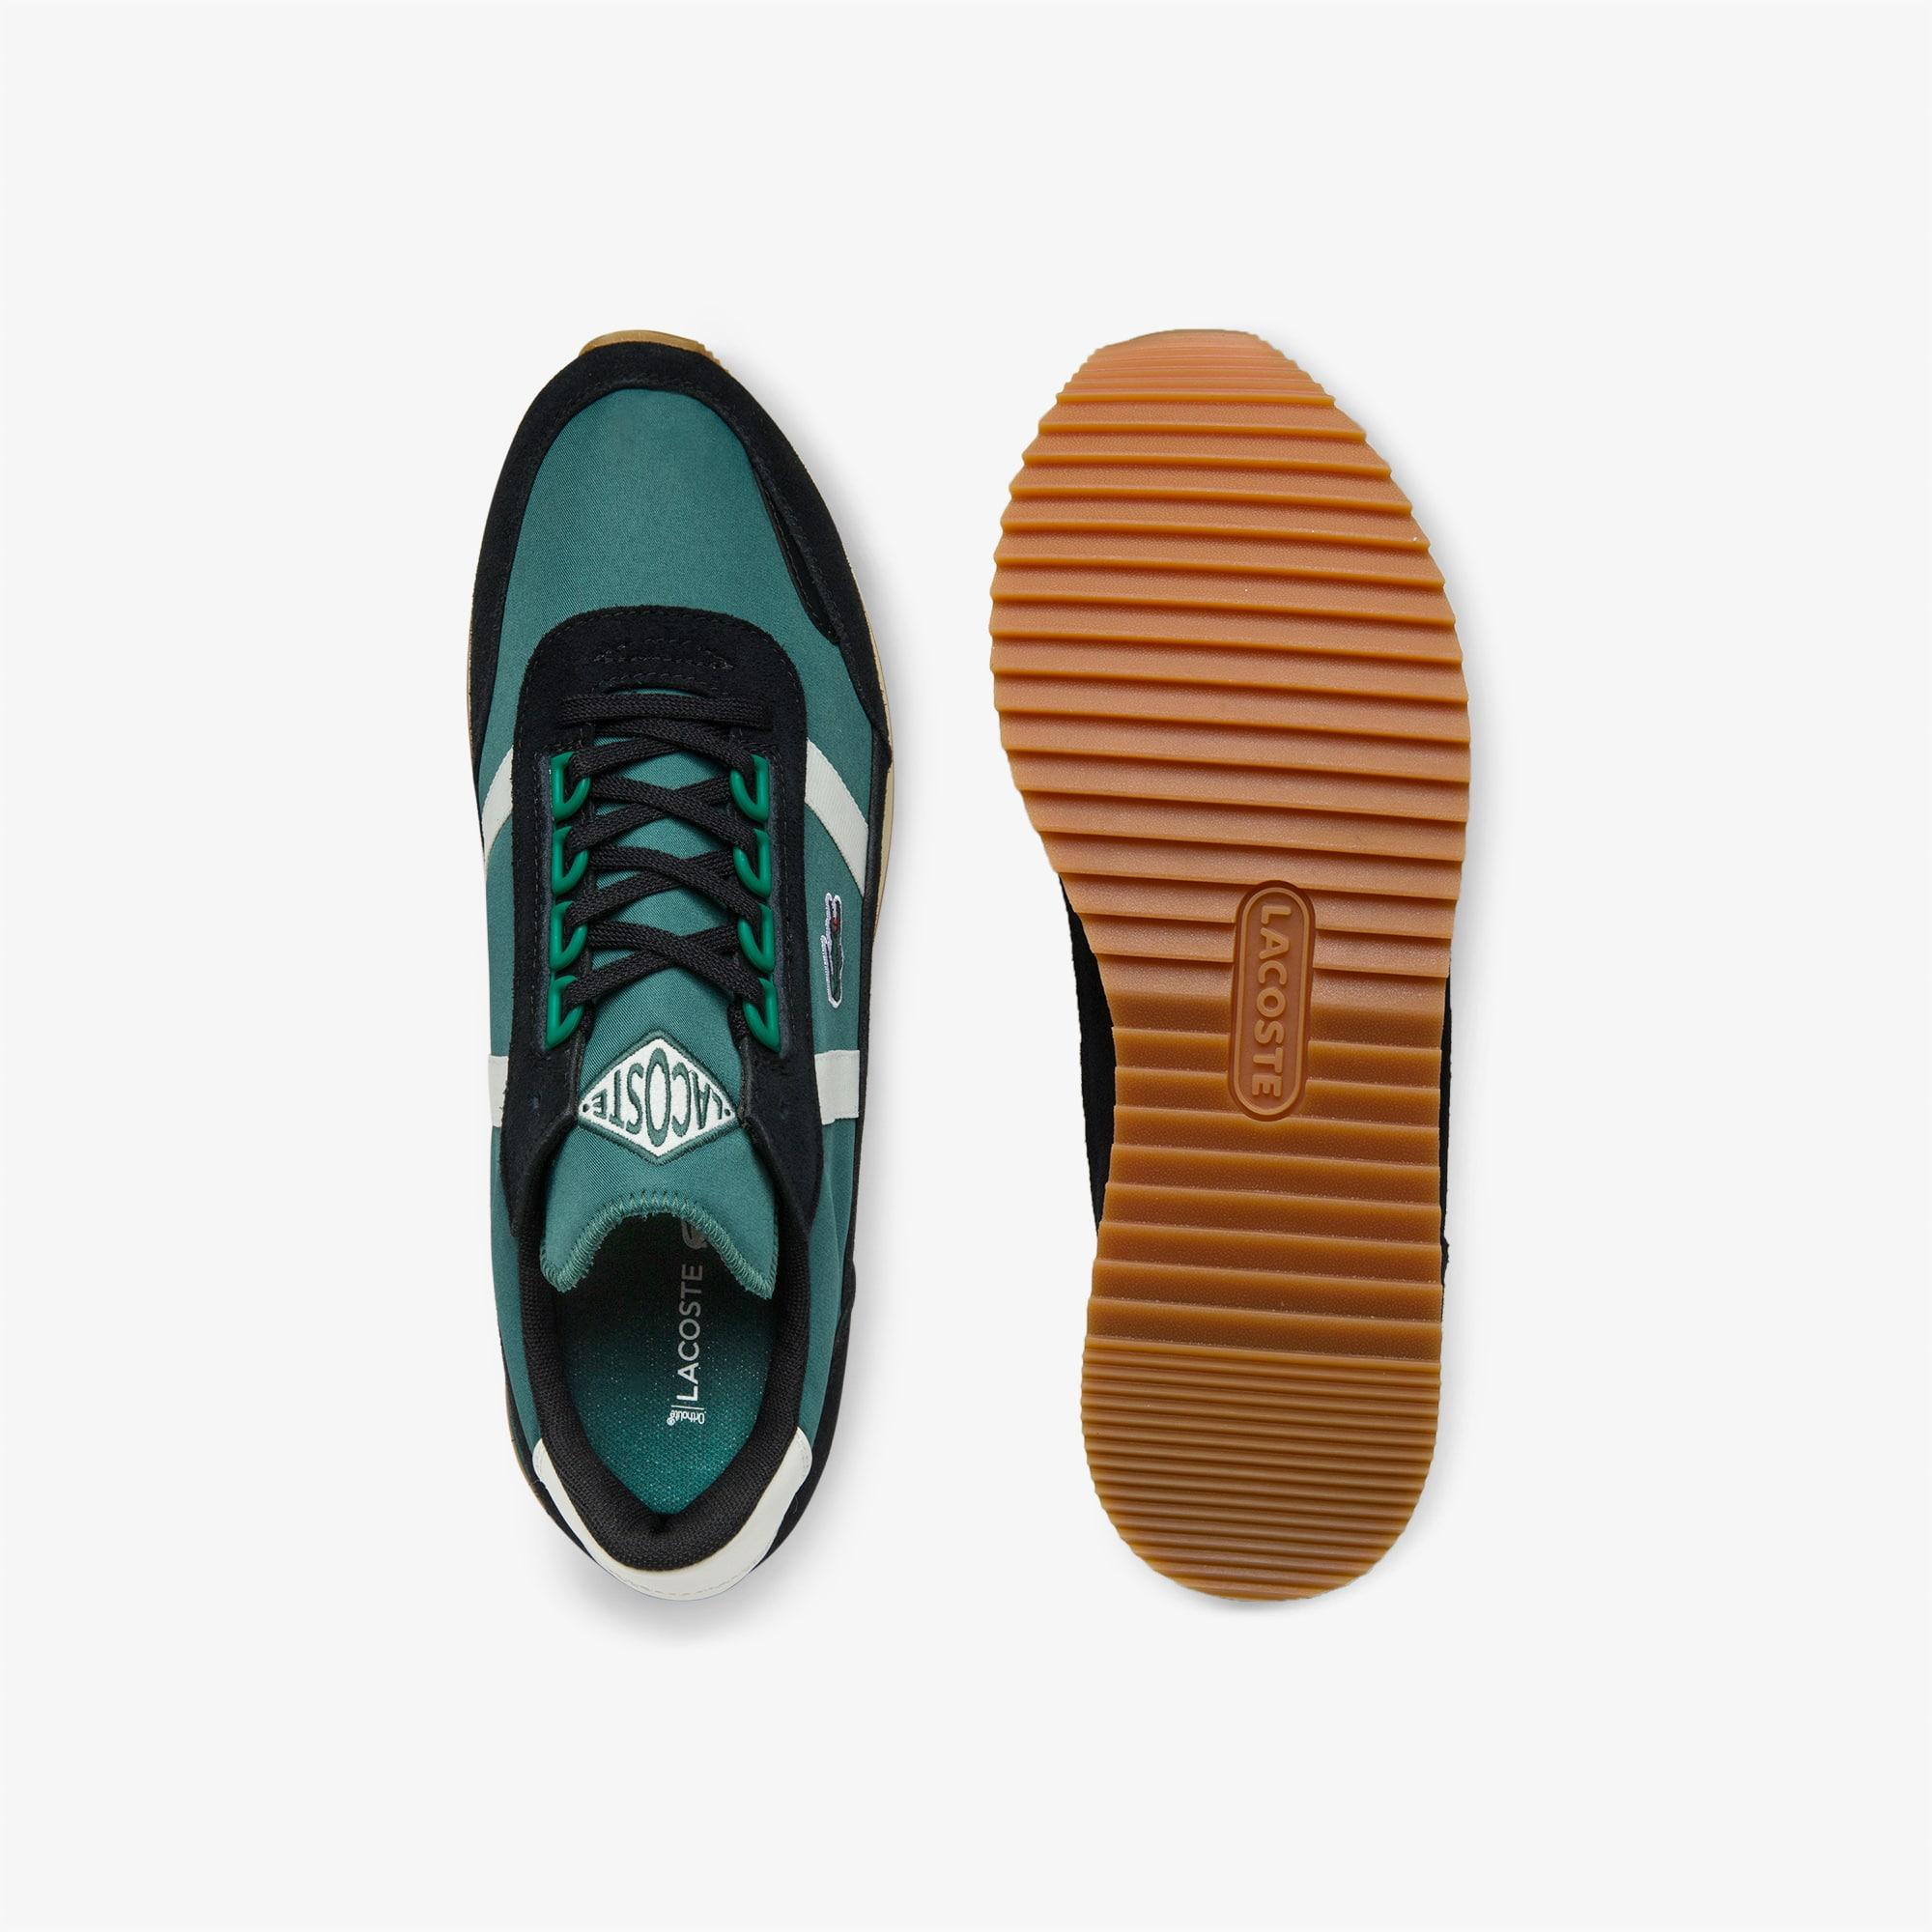 Homme Retro Nylon Partner Suède En Et Sneaker 0wXZON8nkP